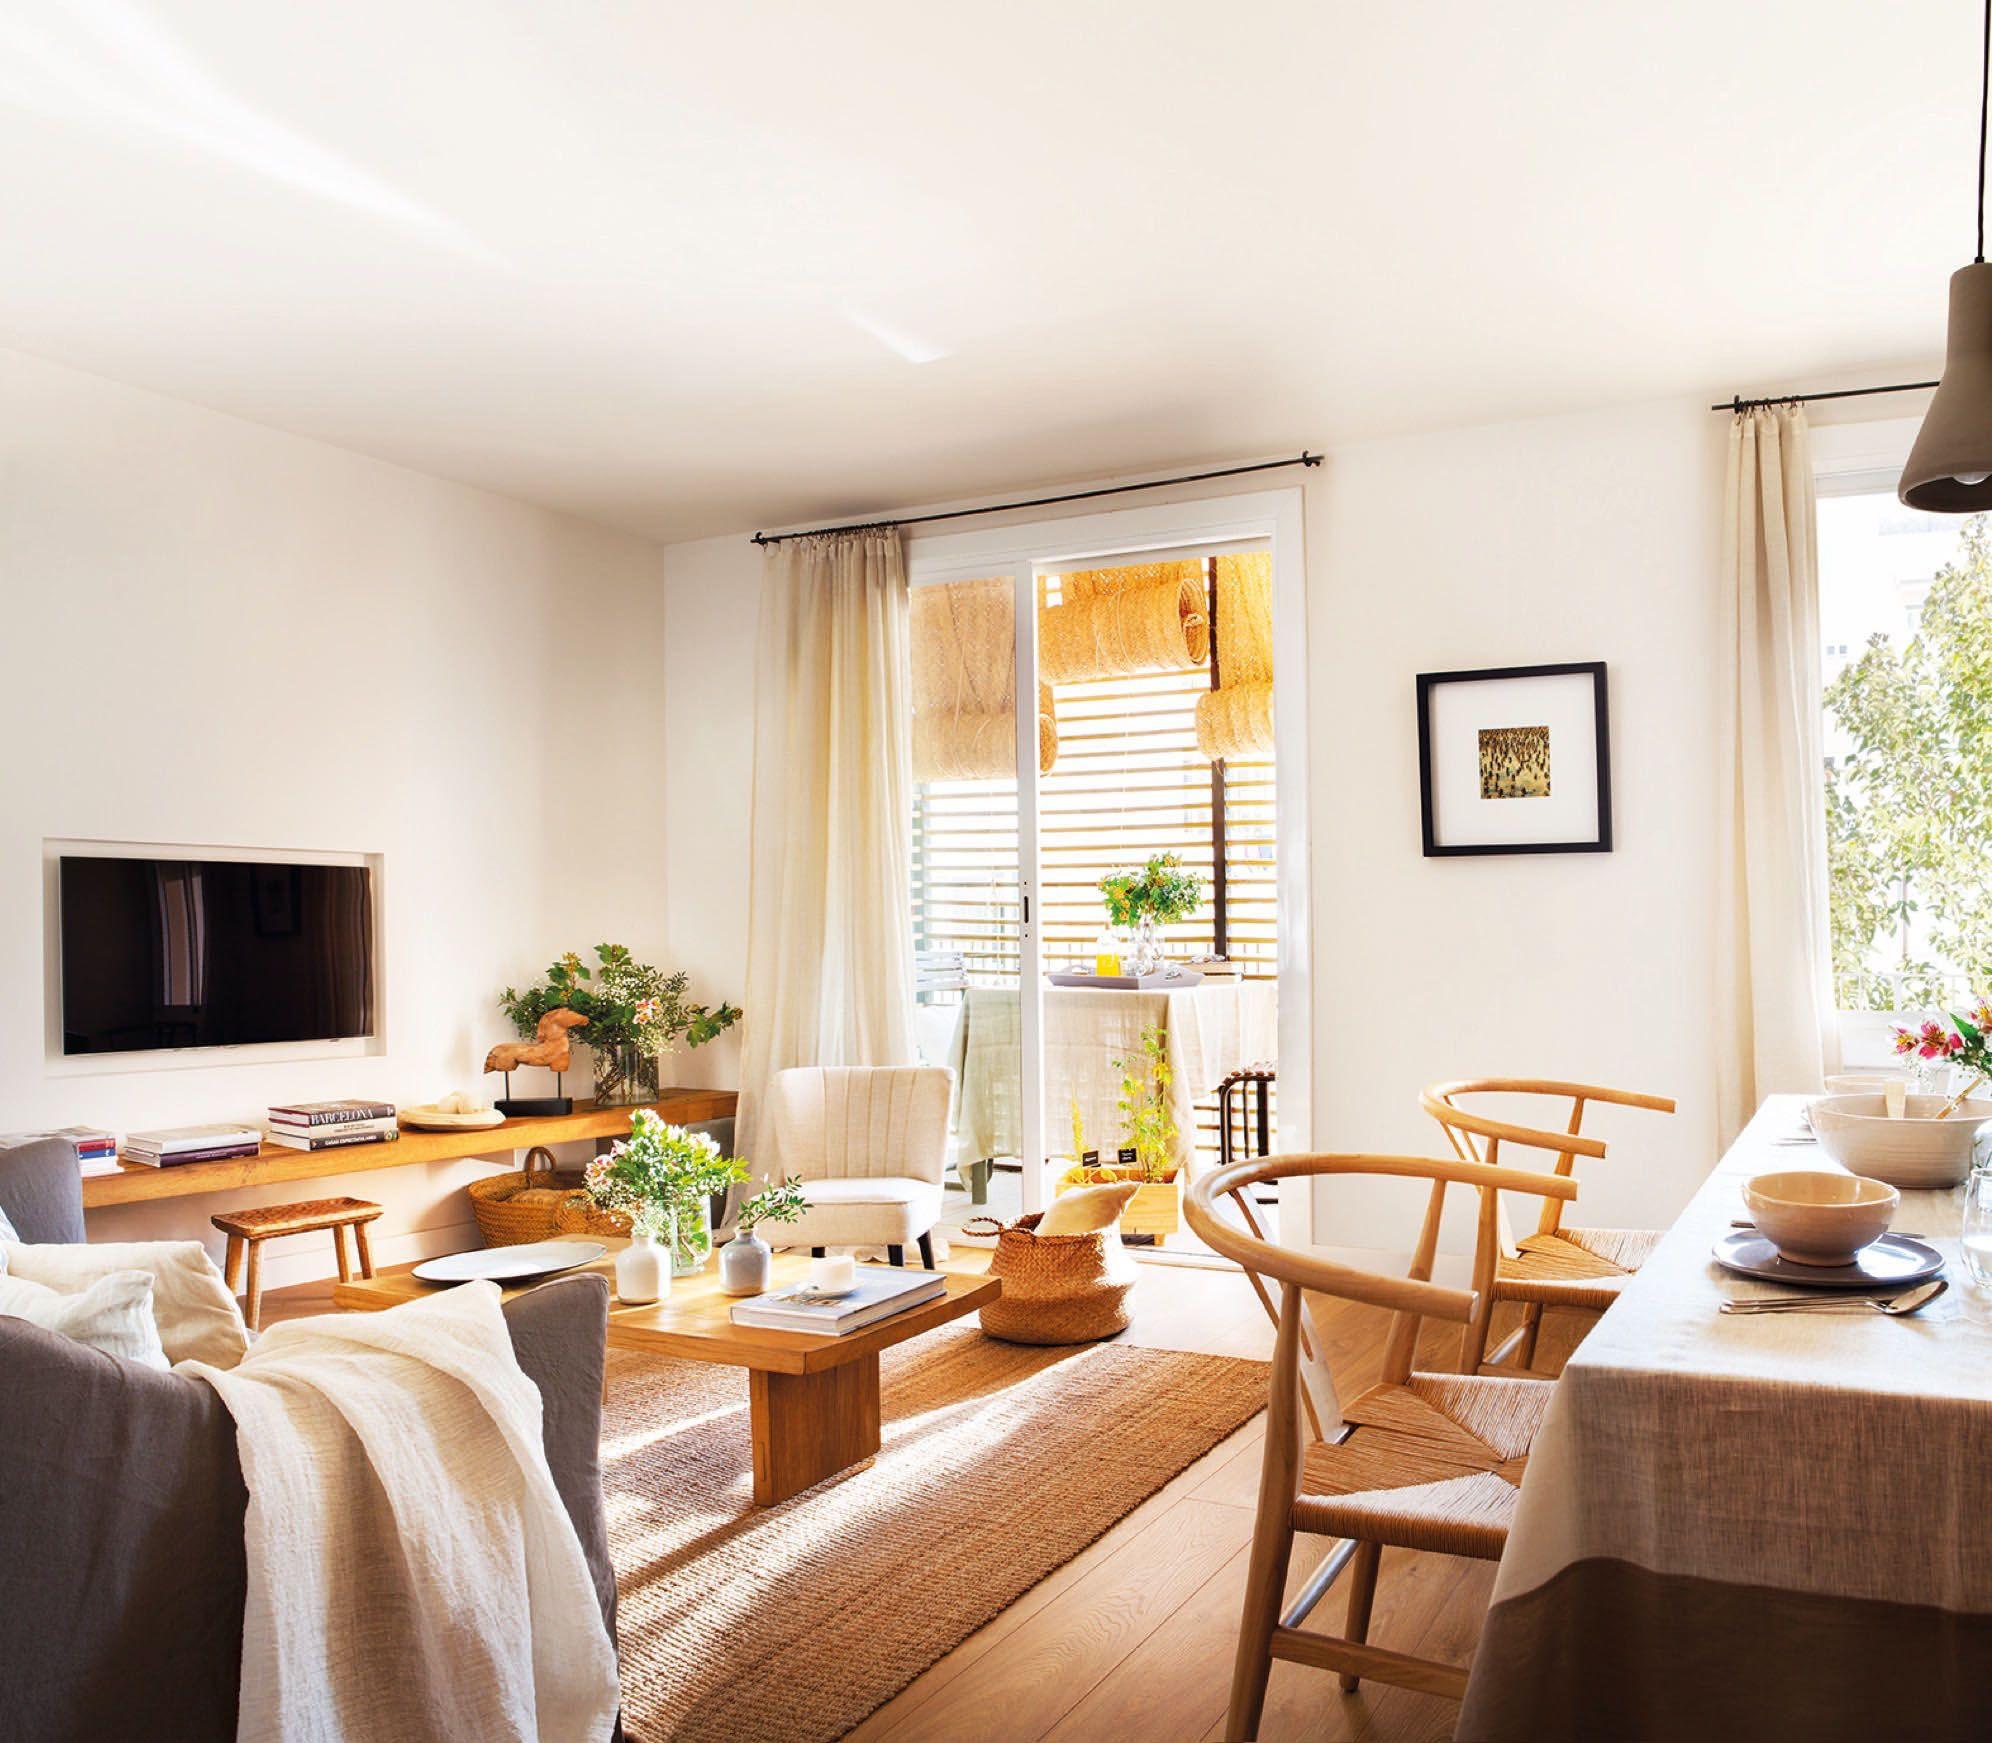 Requisitos para un primer dulce hogar | Pinterest